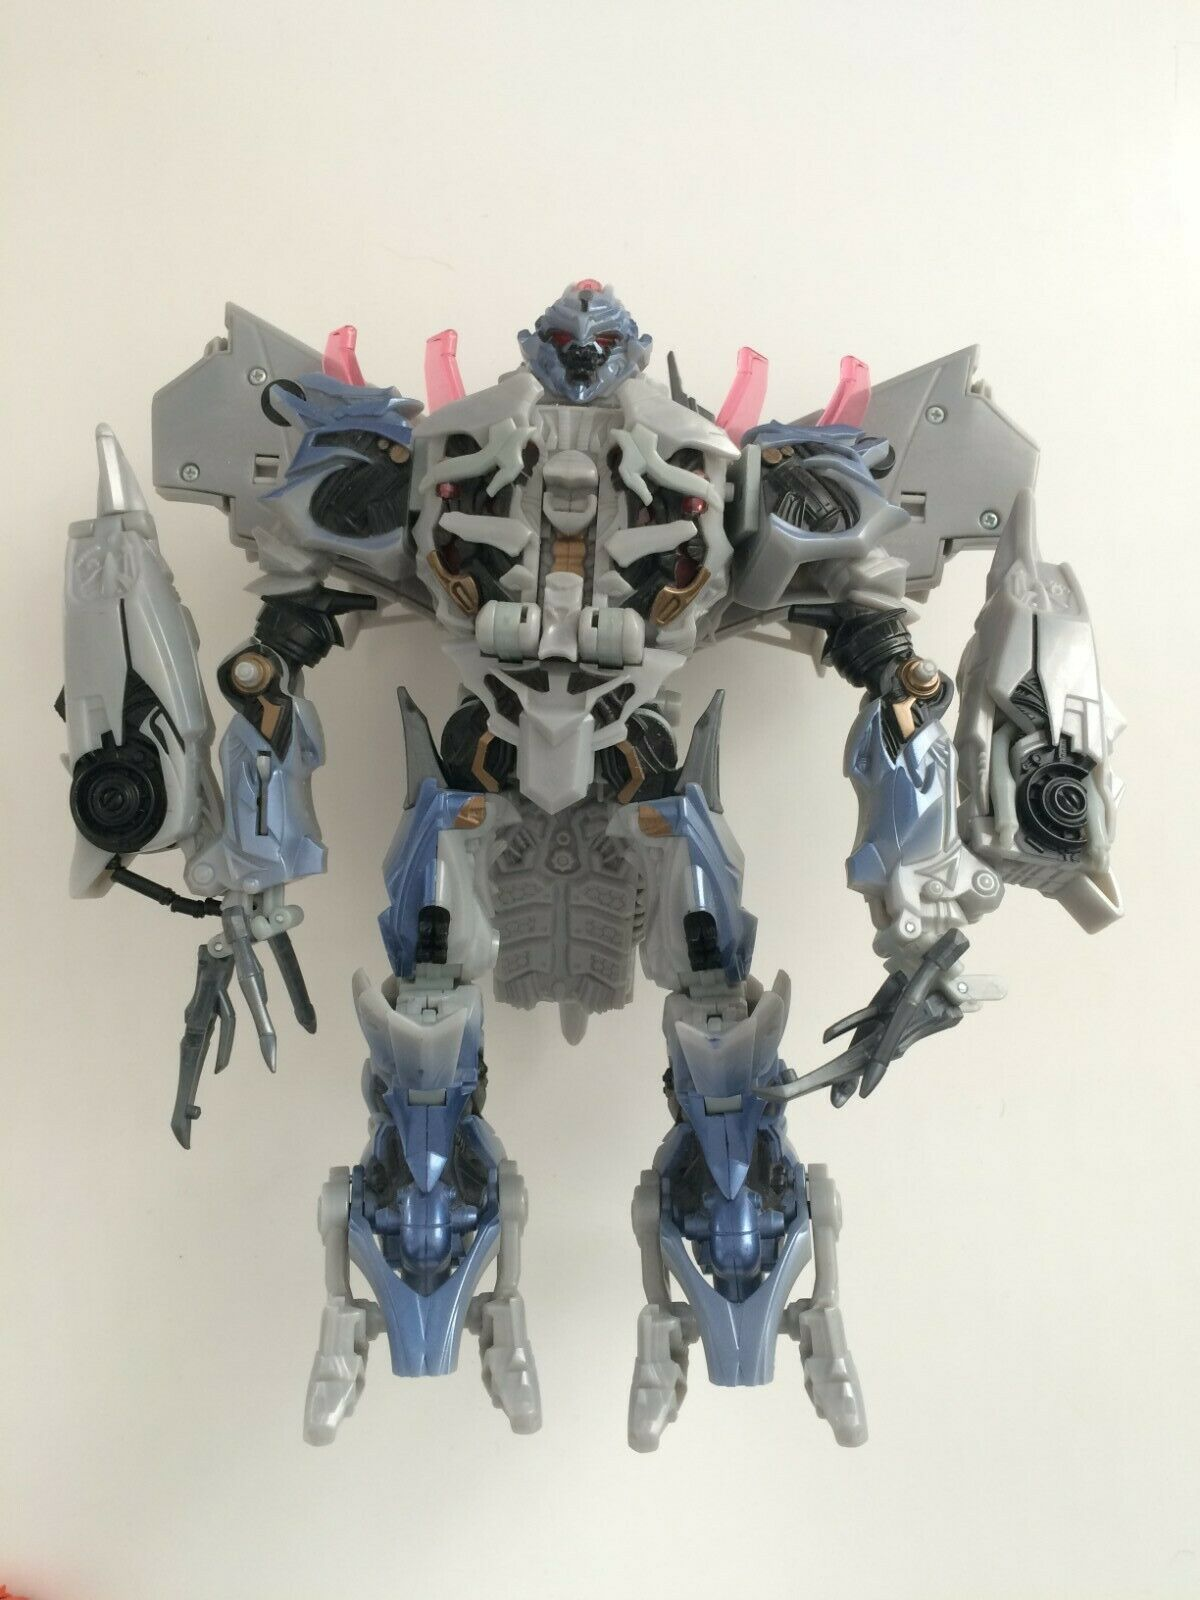 Transformers Decepticon classeE leader Megatron cifra (2007)